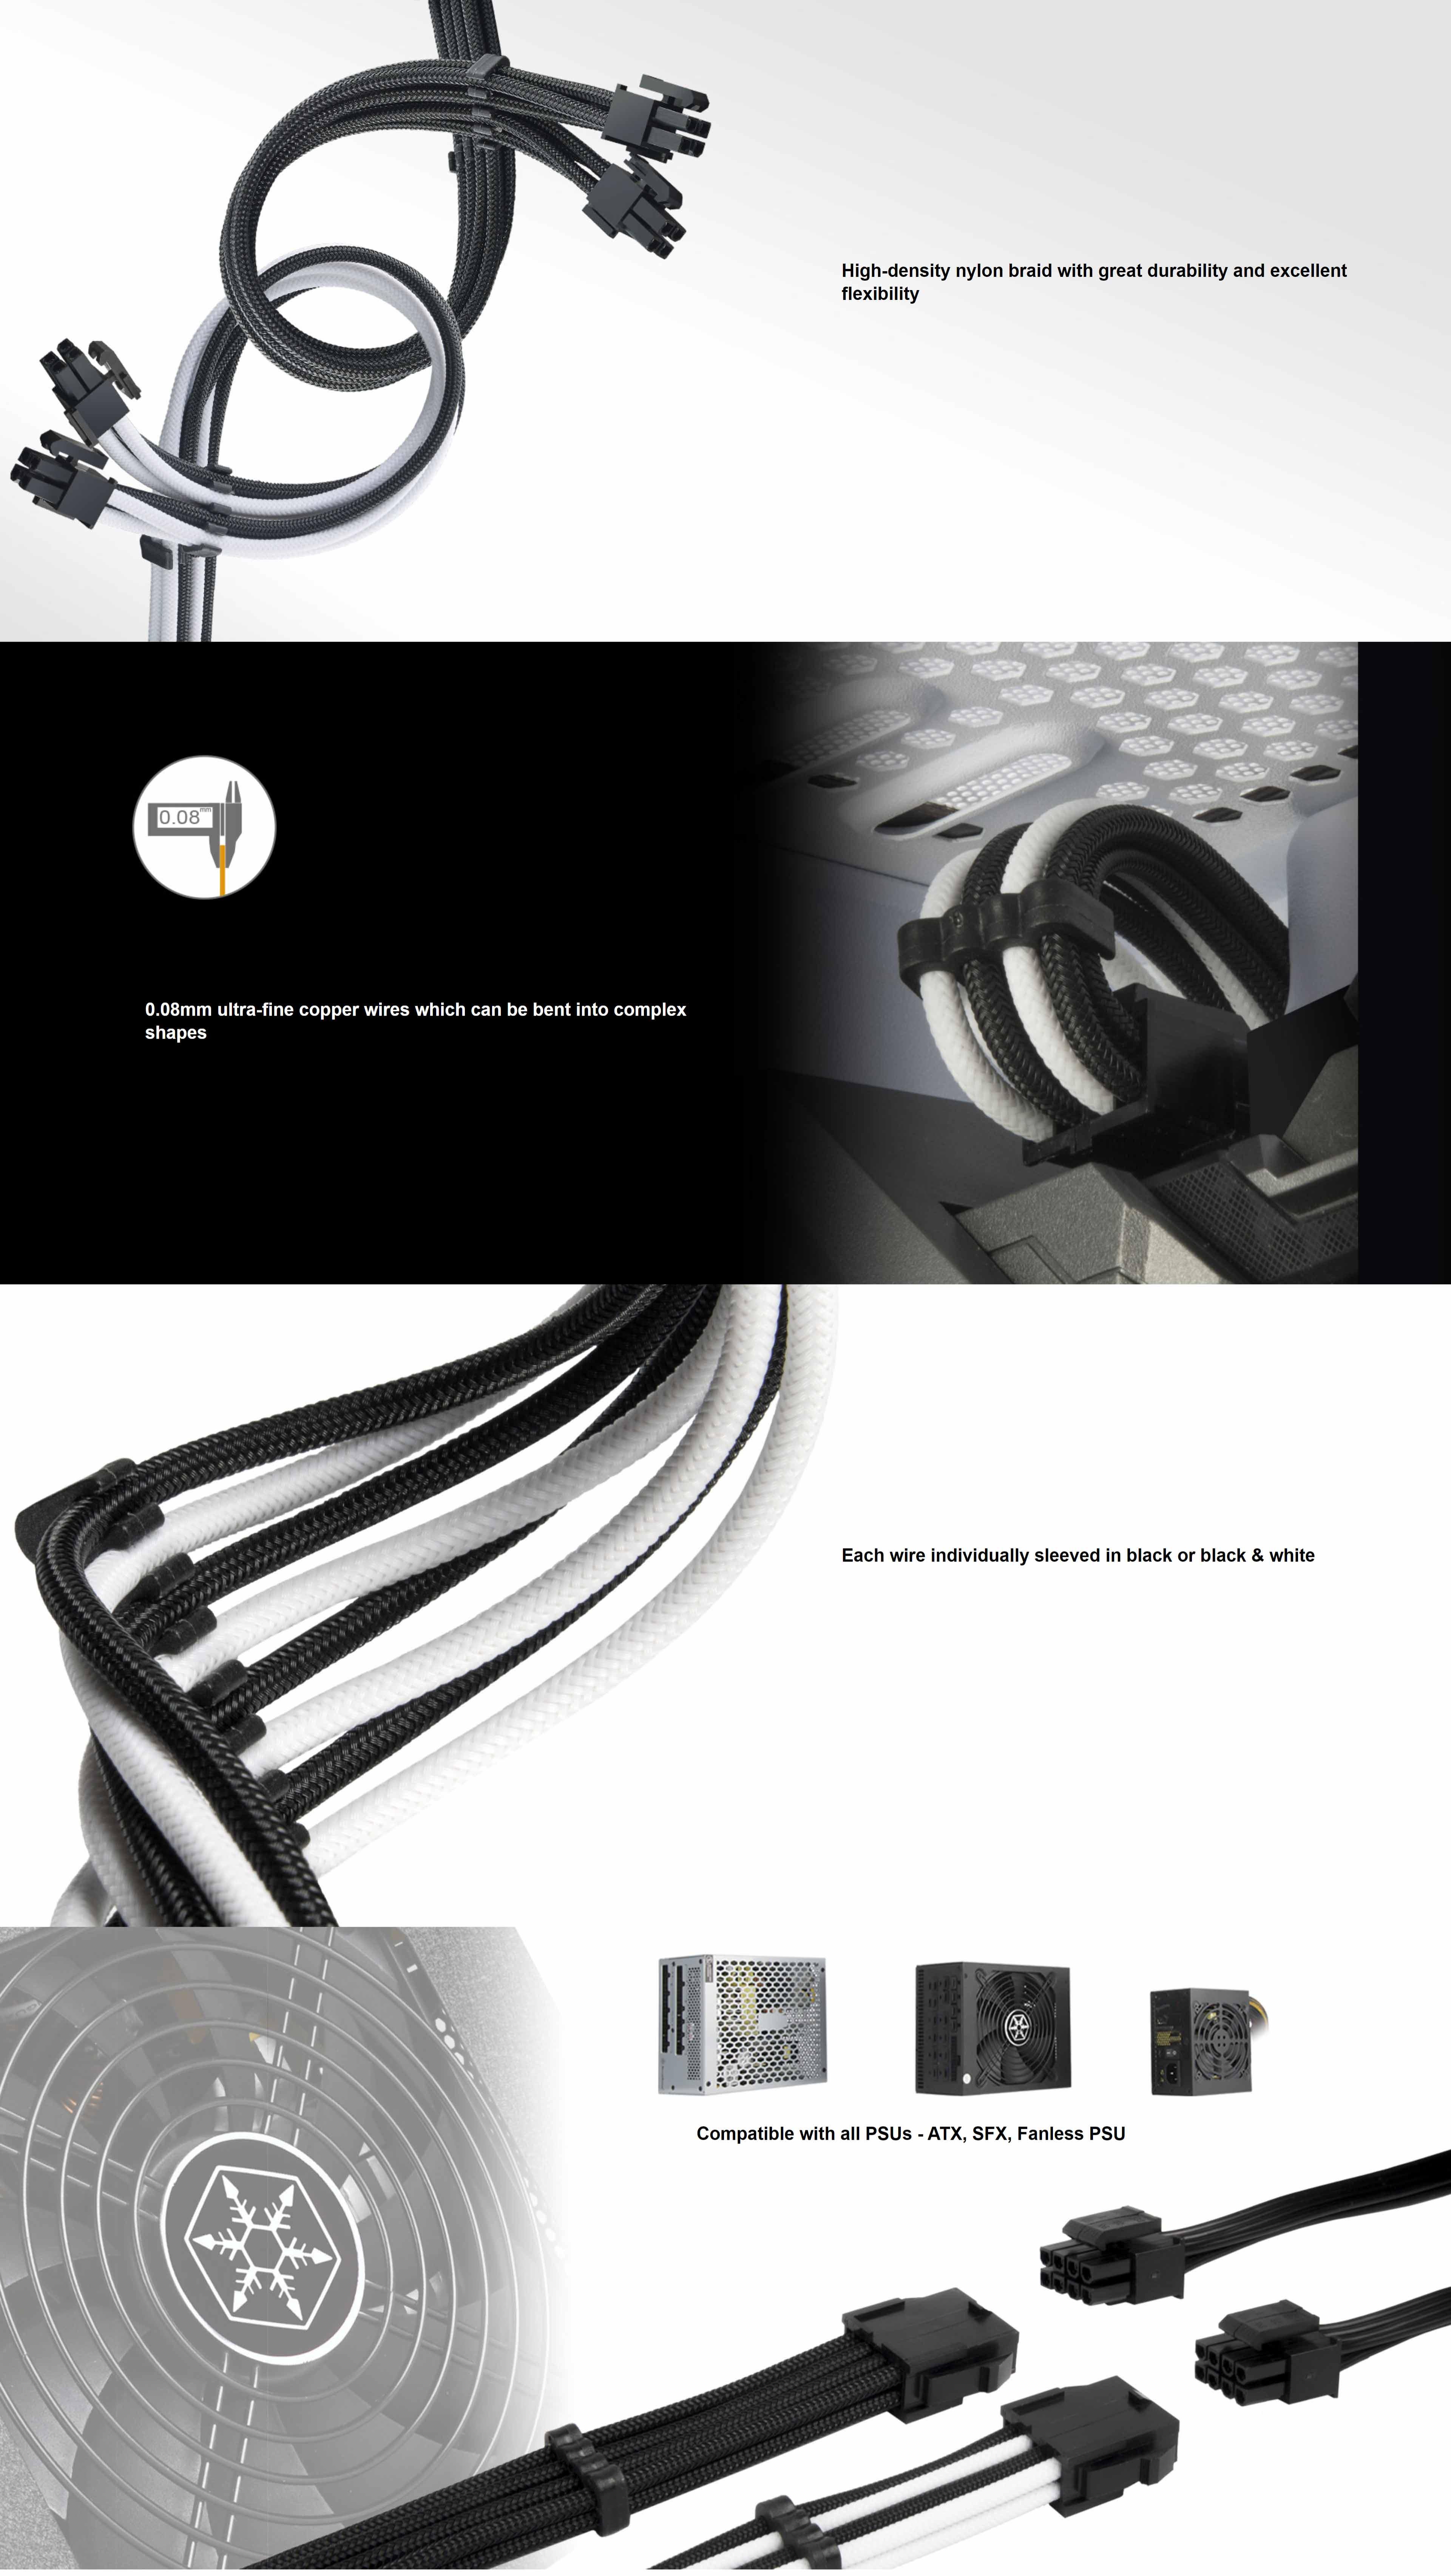 screencapture-silverstonetek-product-php-2020-06-17-16_13_01.jpg